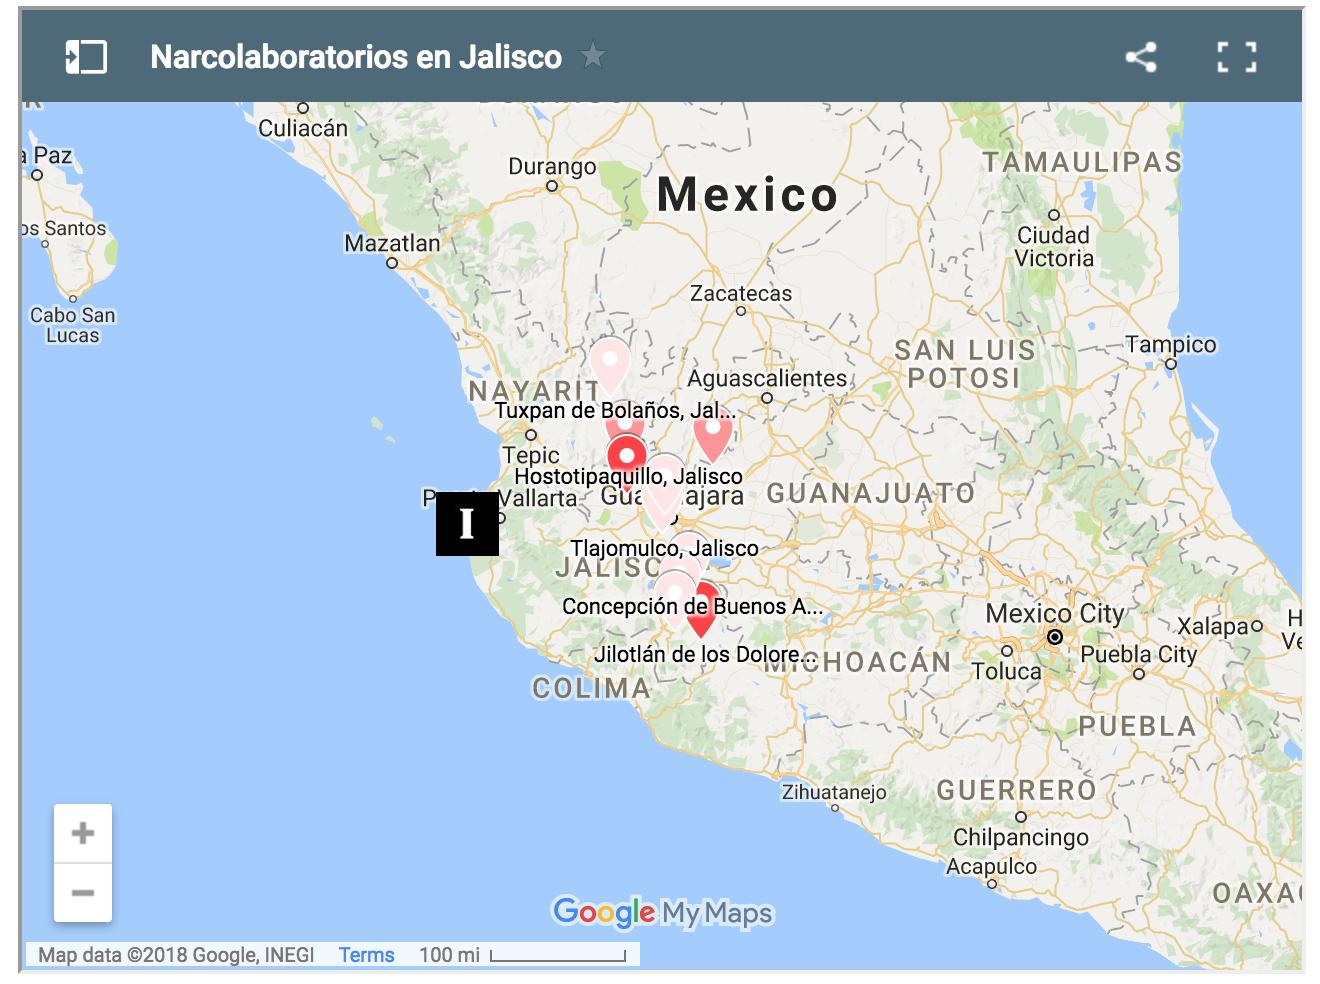 Borderland Beat: Jalisco: The Plague of Narco-Laboratories